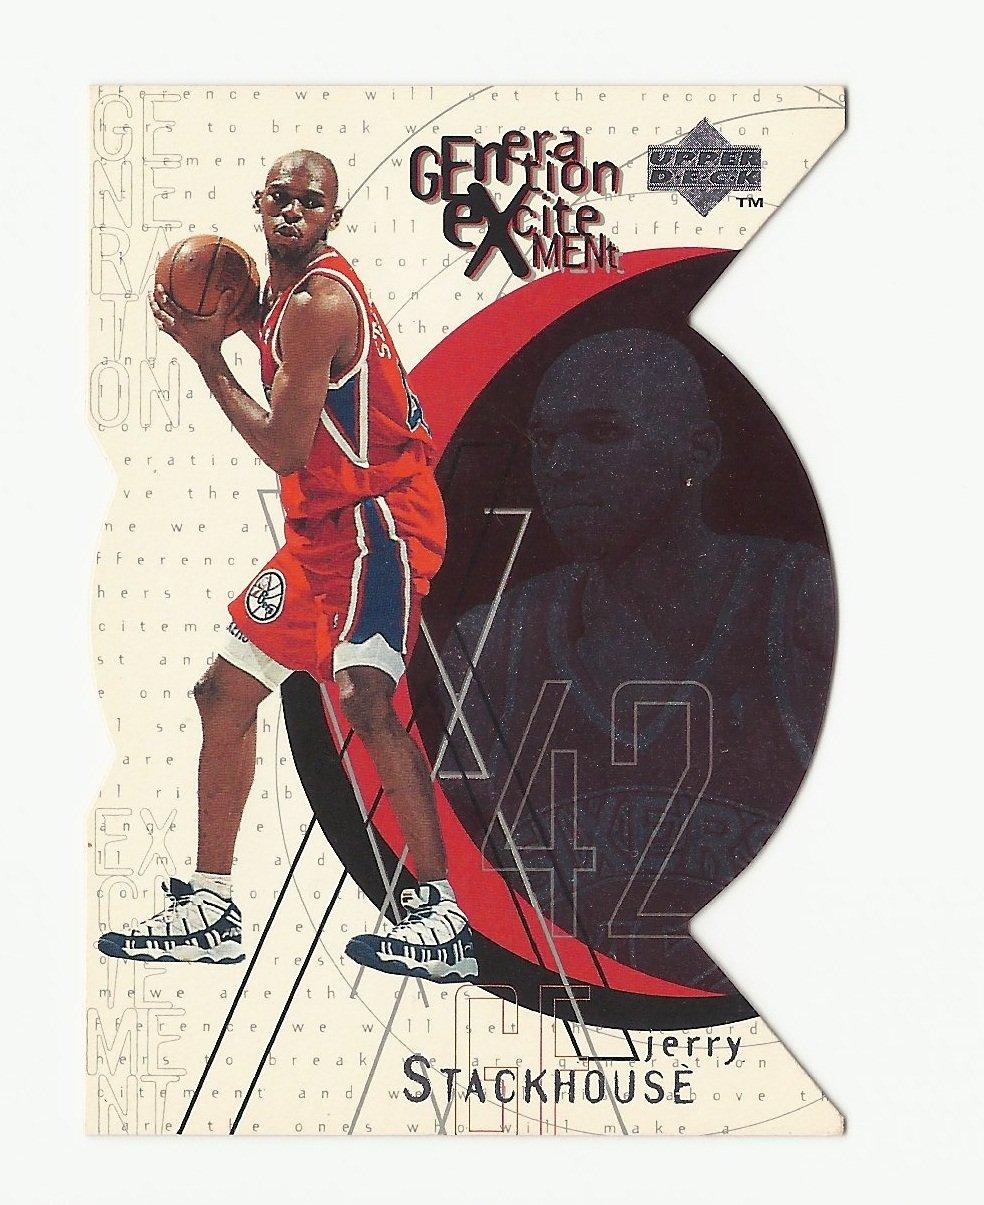 Jerry Stackhouse 1996 Upper Deck Generation Excitement Insert Card #G13 Philadelphia 76ers